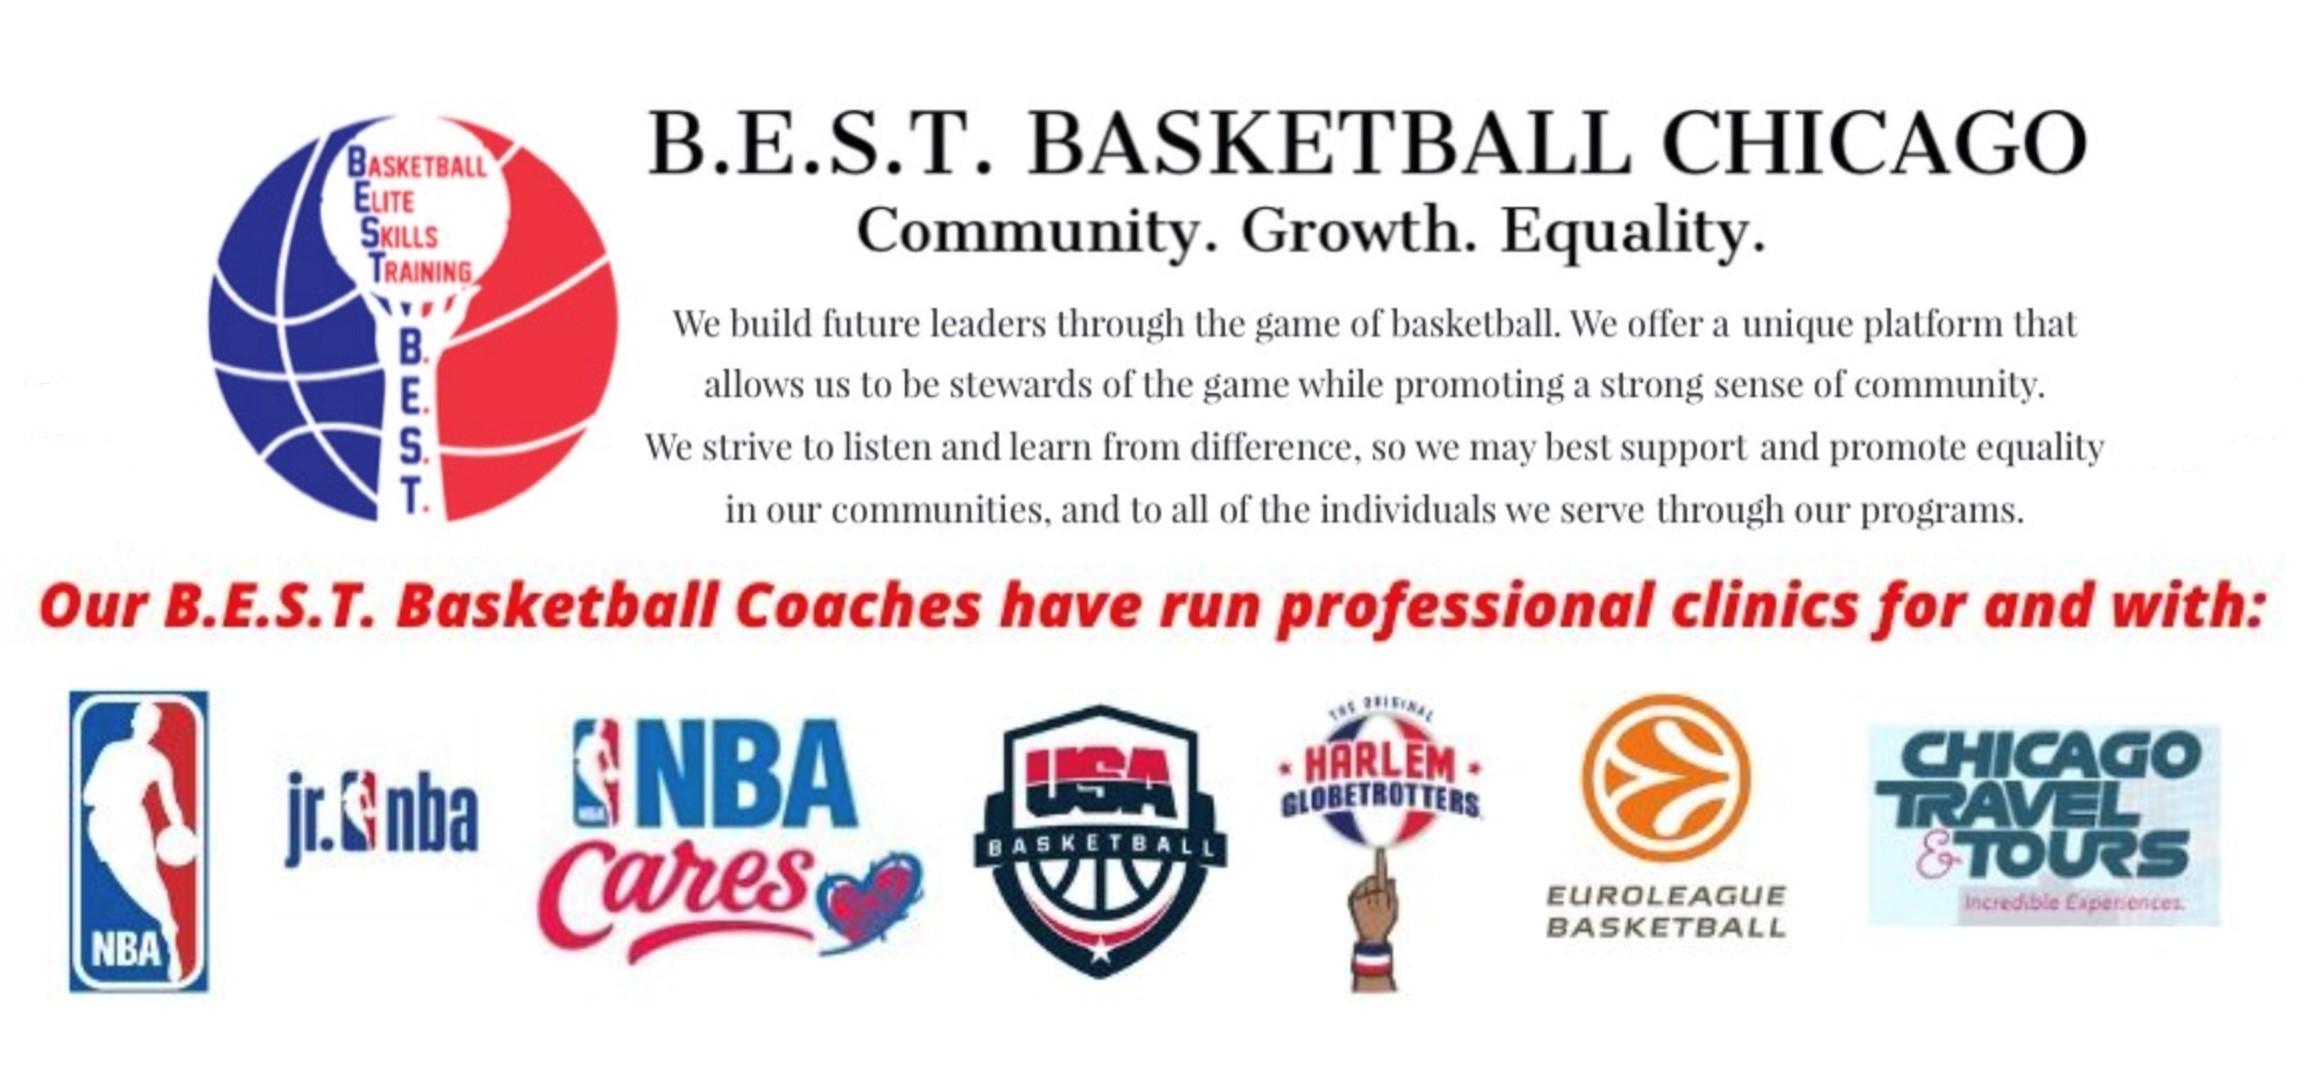 B.E.S.T., Basketball, Point, Court